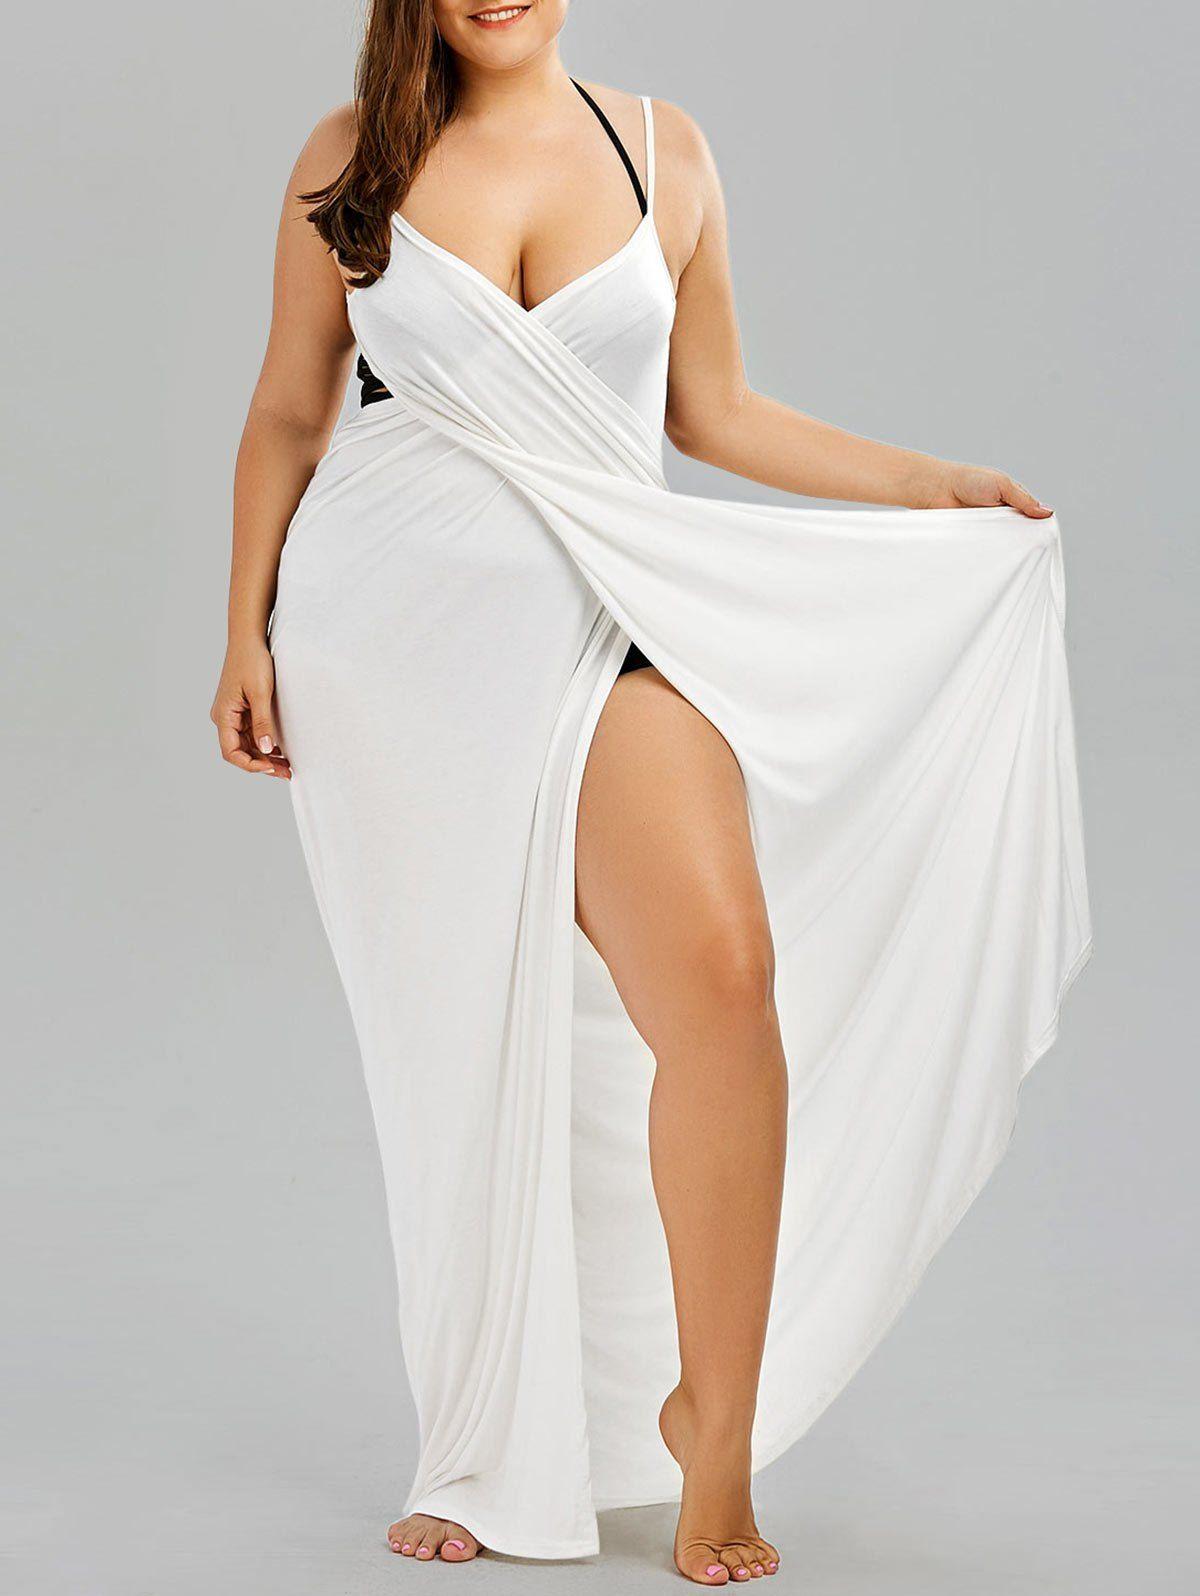 Plus Size Flowy Cover Up Wrap Dress Maxi Dress Cocktail Plus Size Outfits Plus Size Swimwear [ 1596 x 1200 Pixel ]